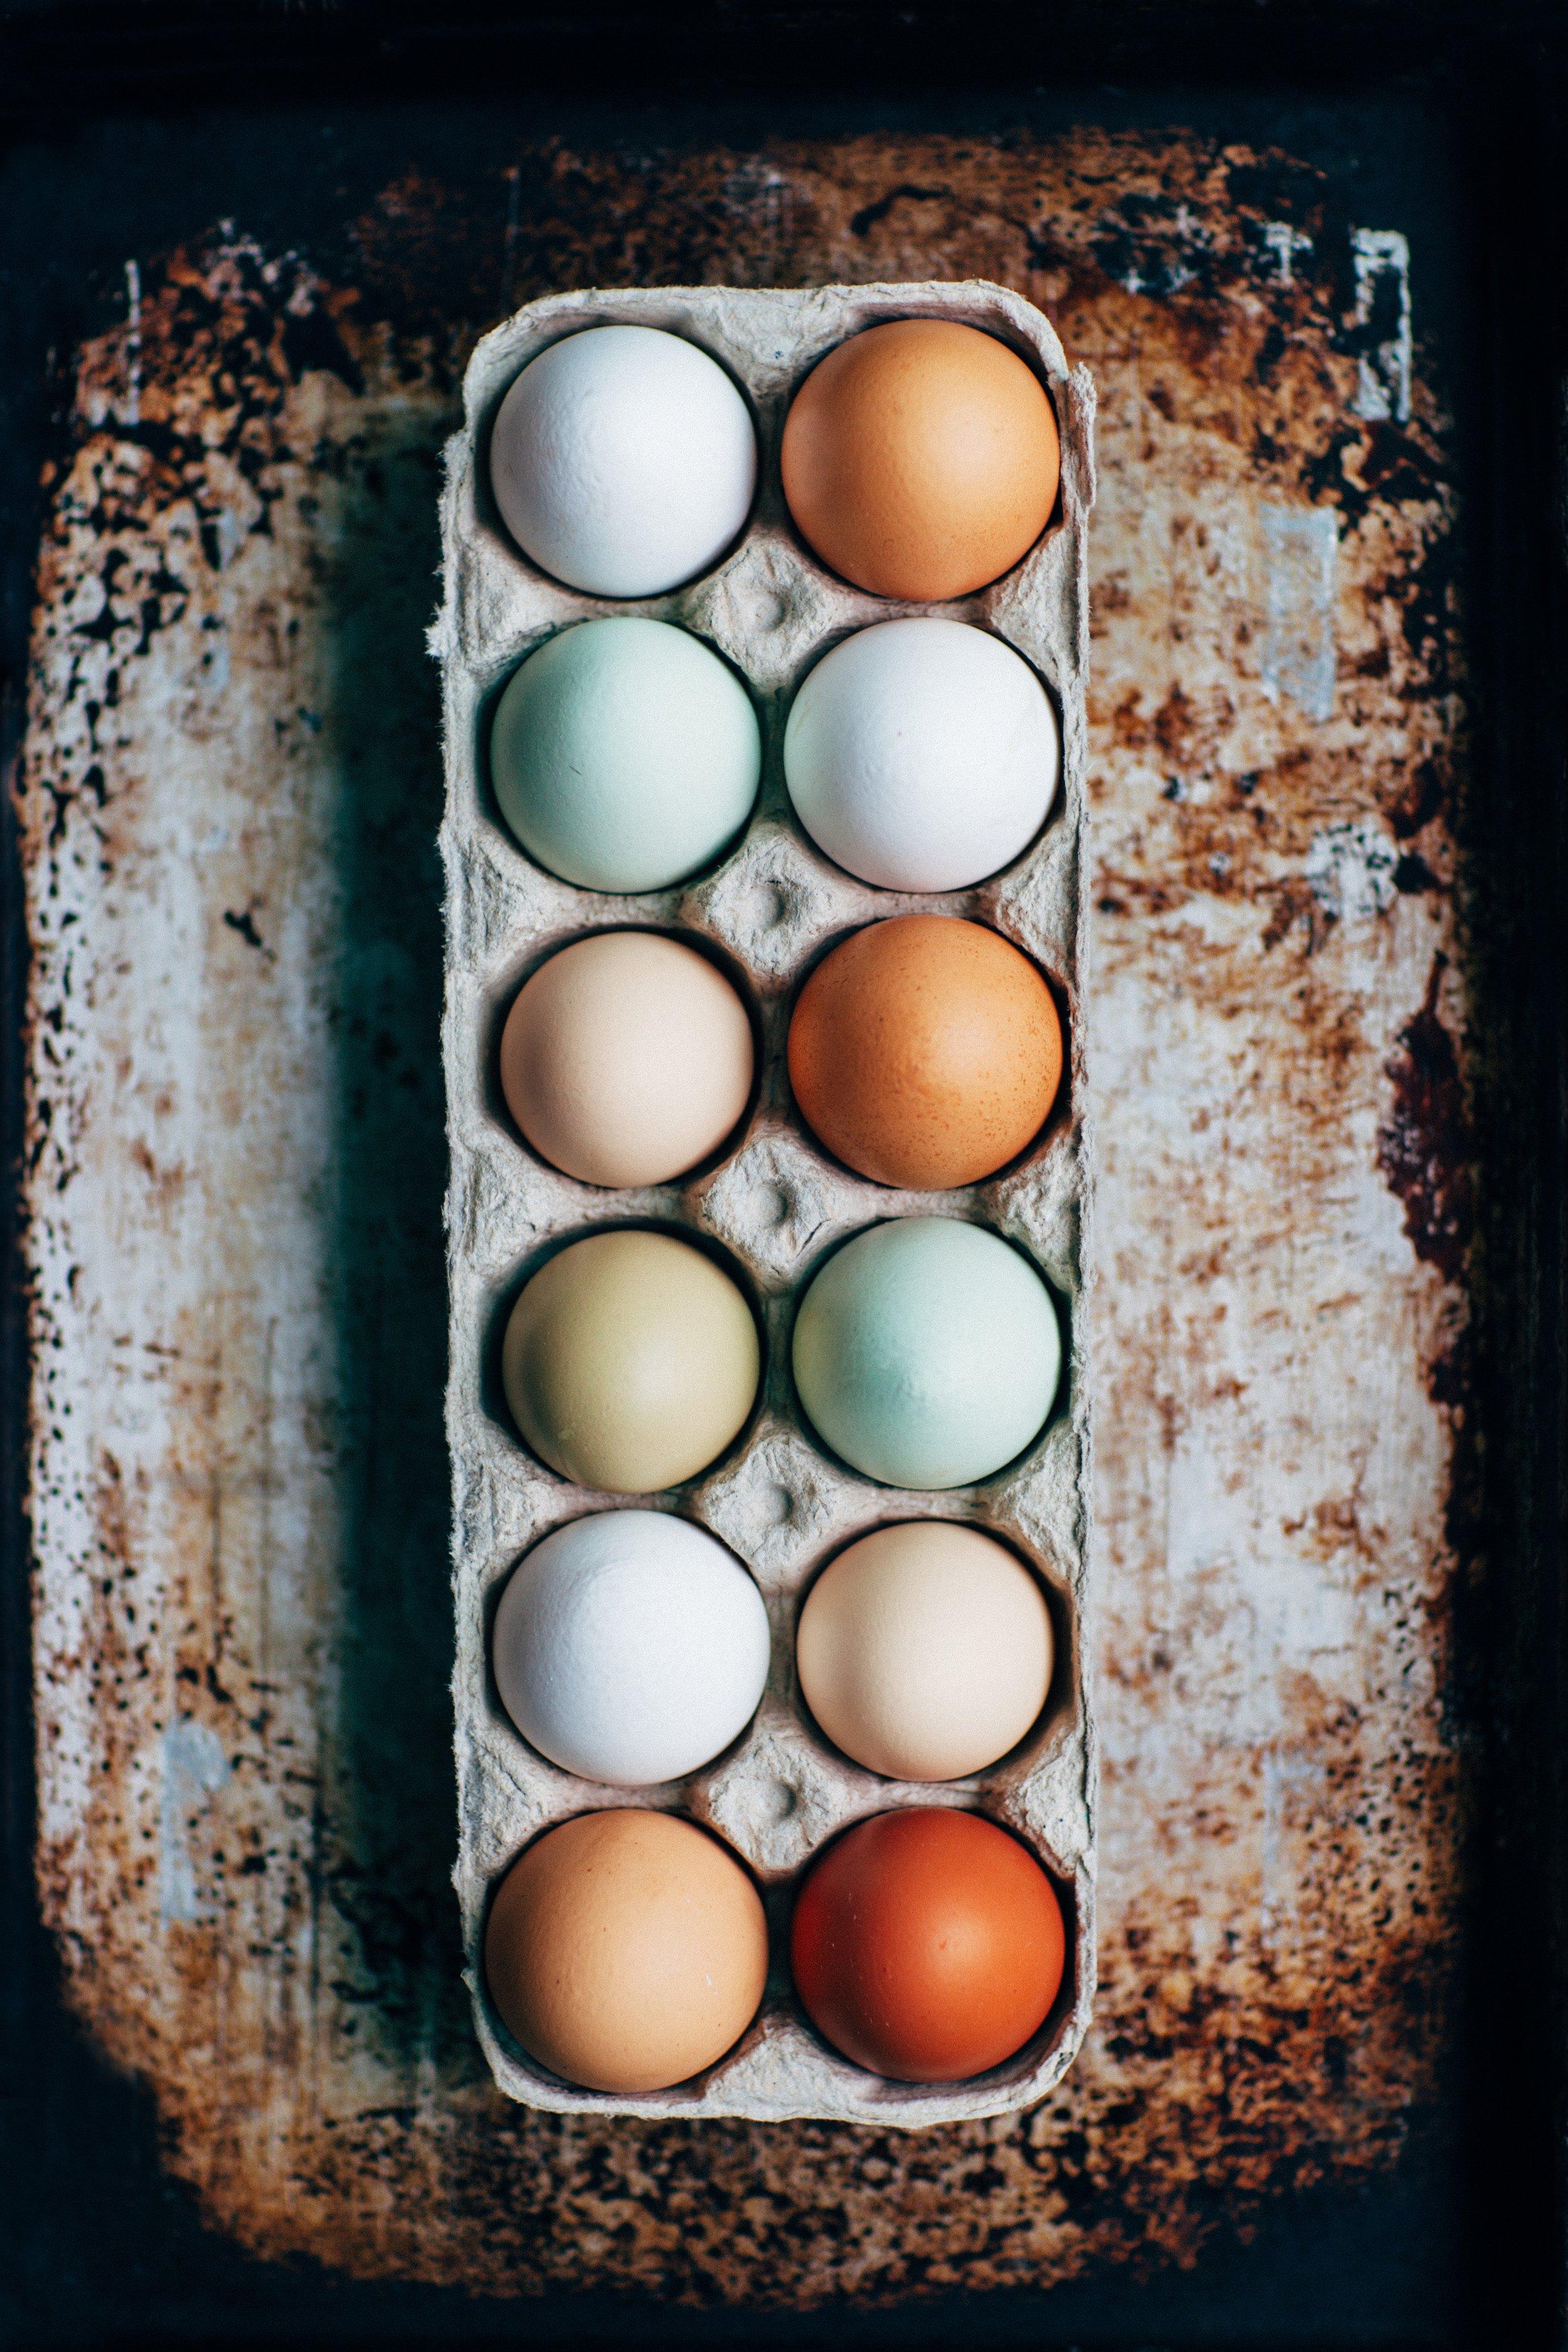 Eggs contain B vitamins, protein, zinc, iron, selenium and vitamin D.